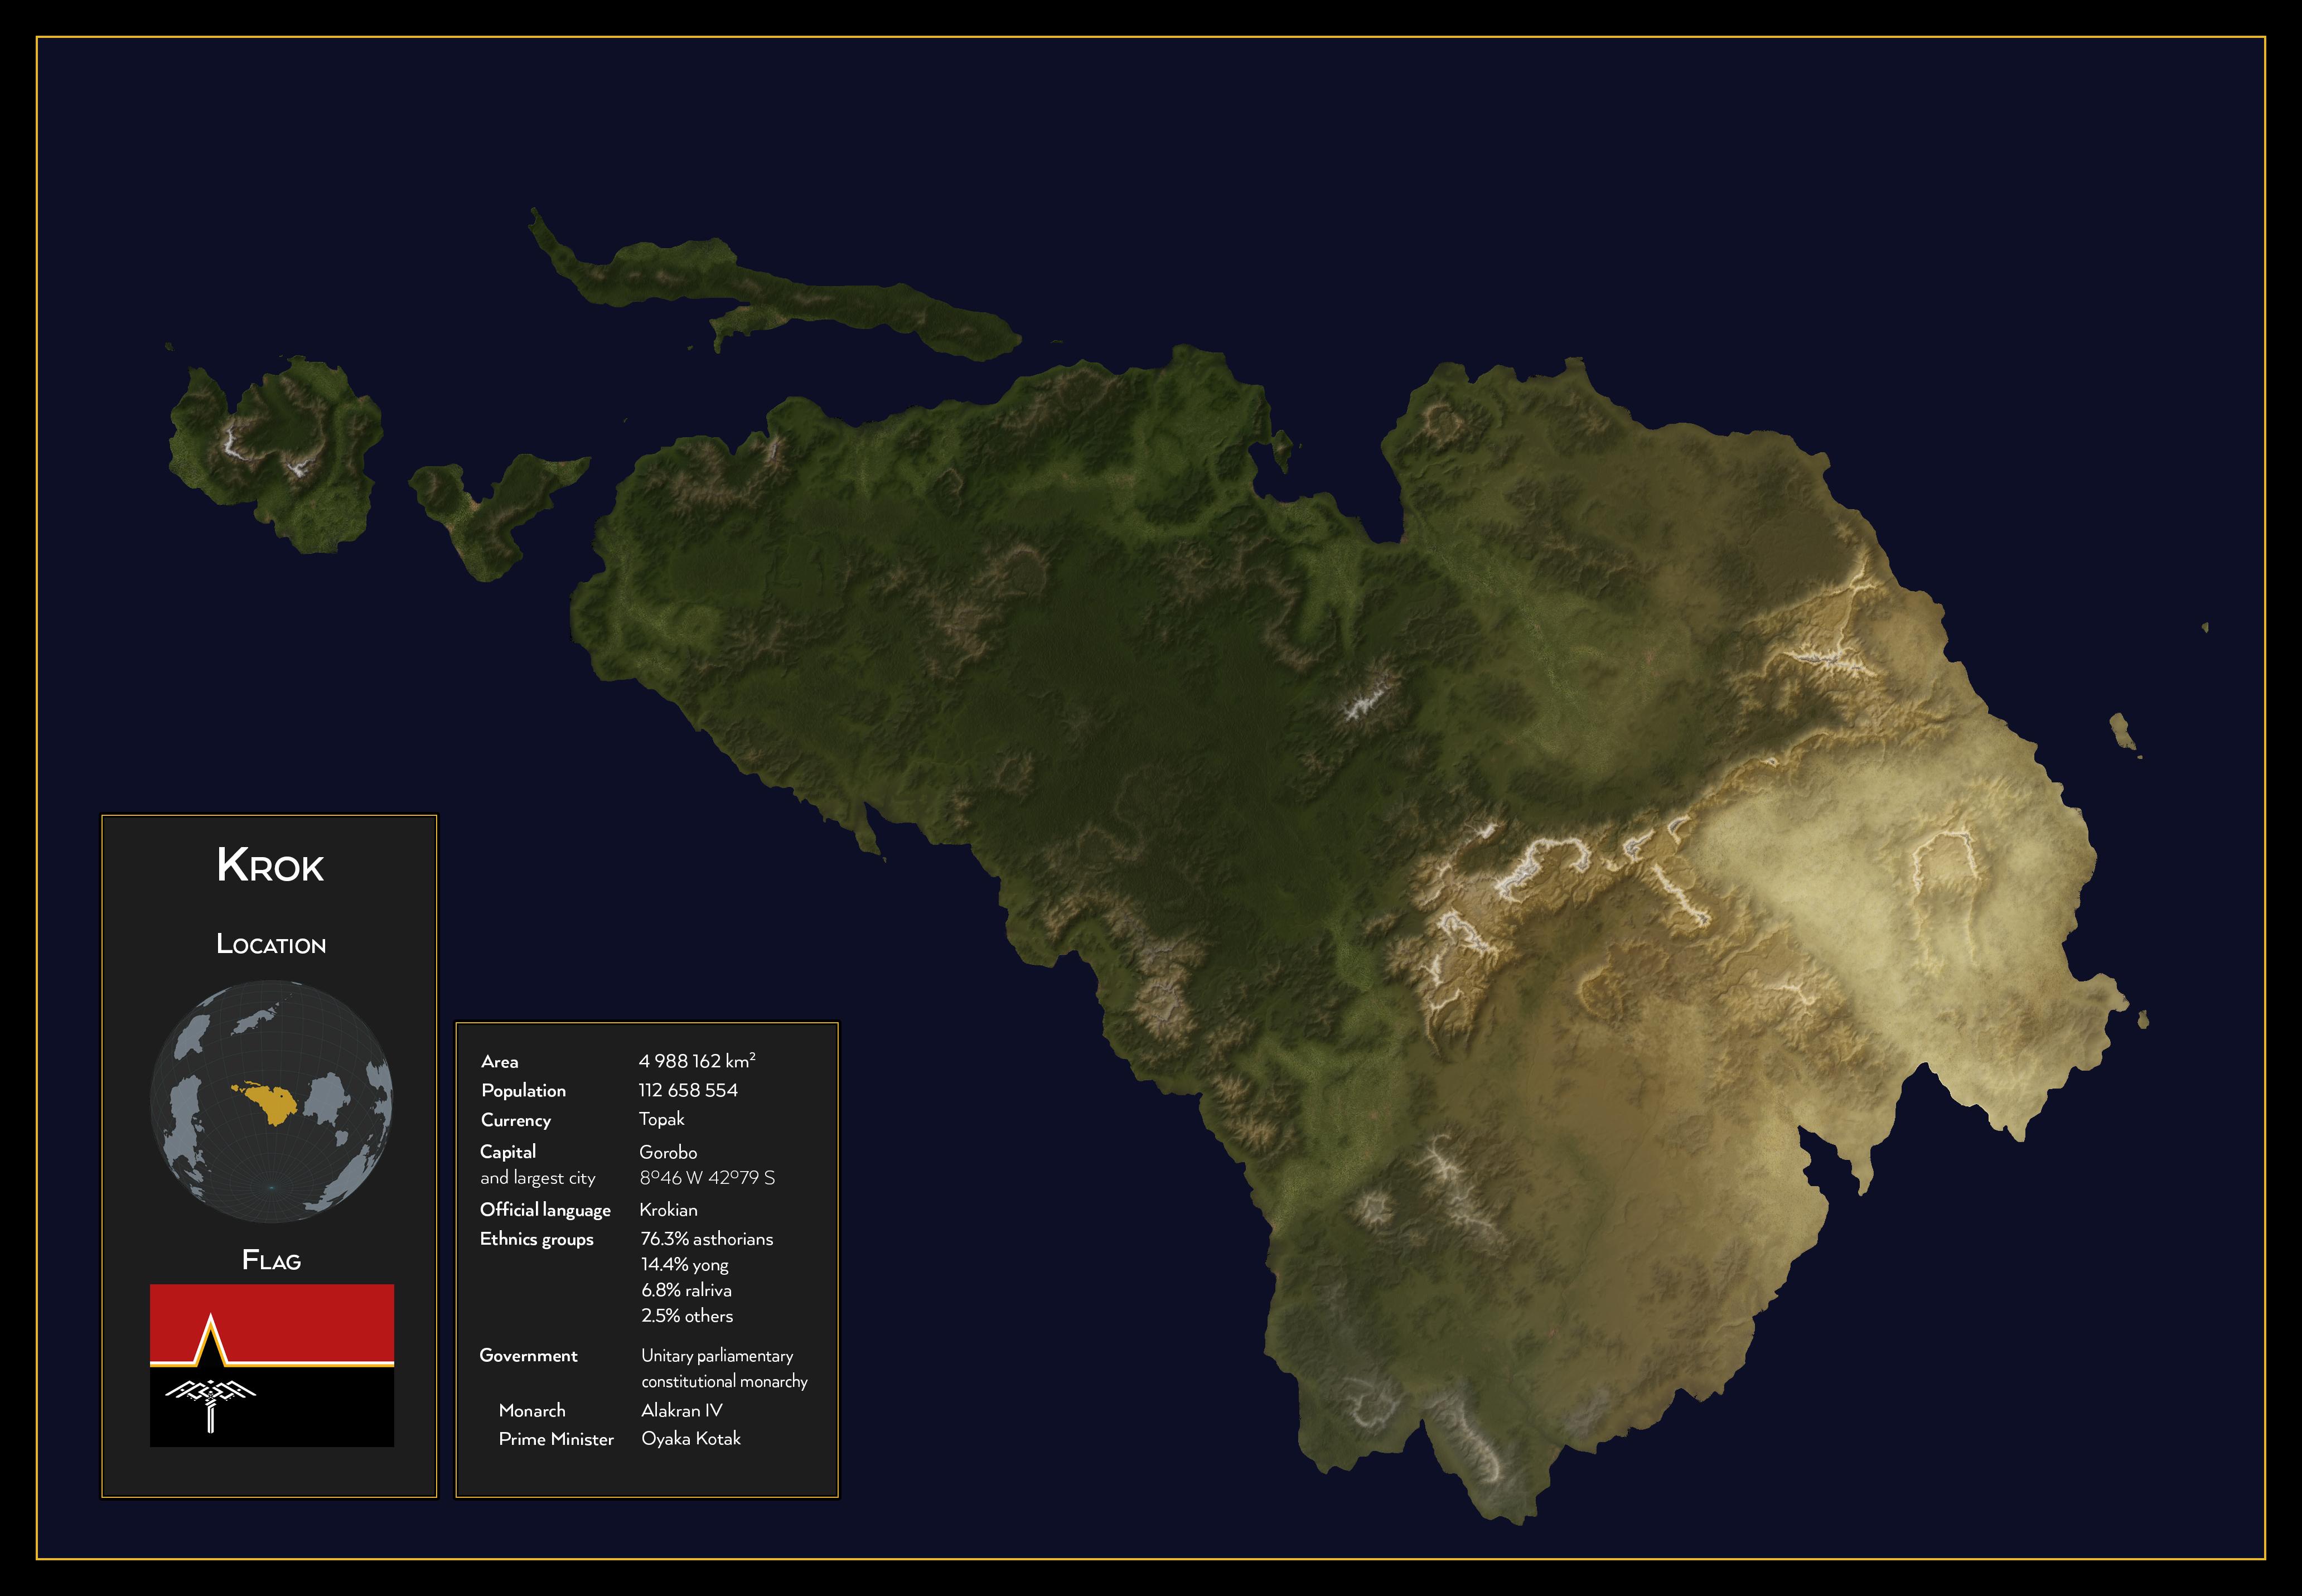 Krok satellite image - World of Evol by SalesWorlds